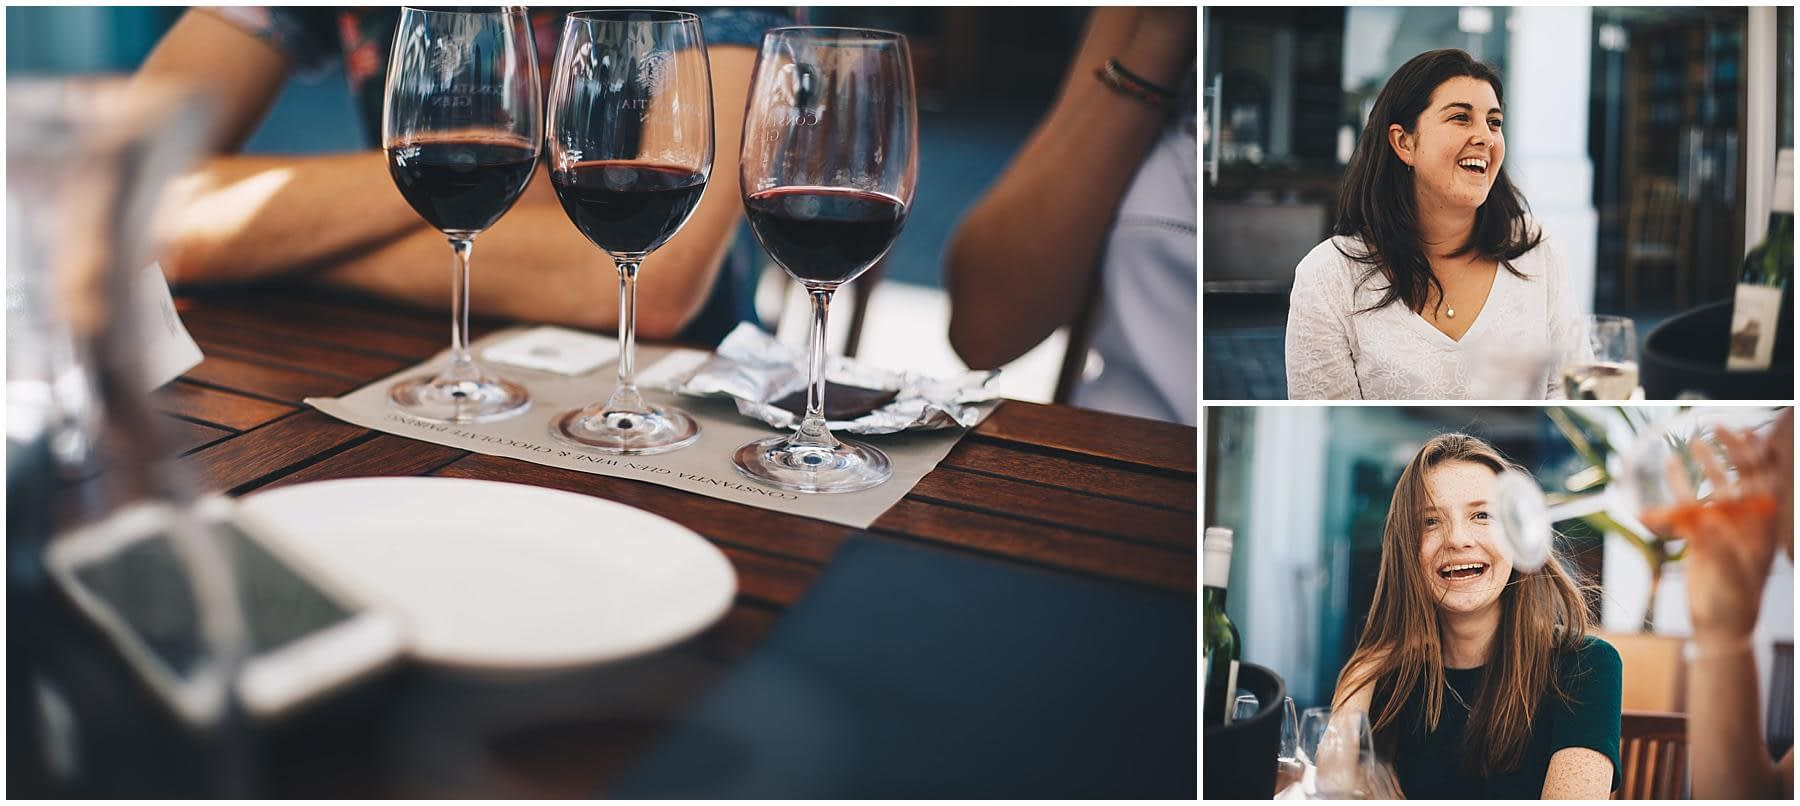 Cape Town_Winetasting_0068.jpg